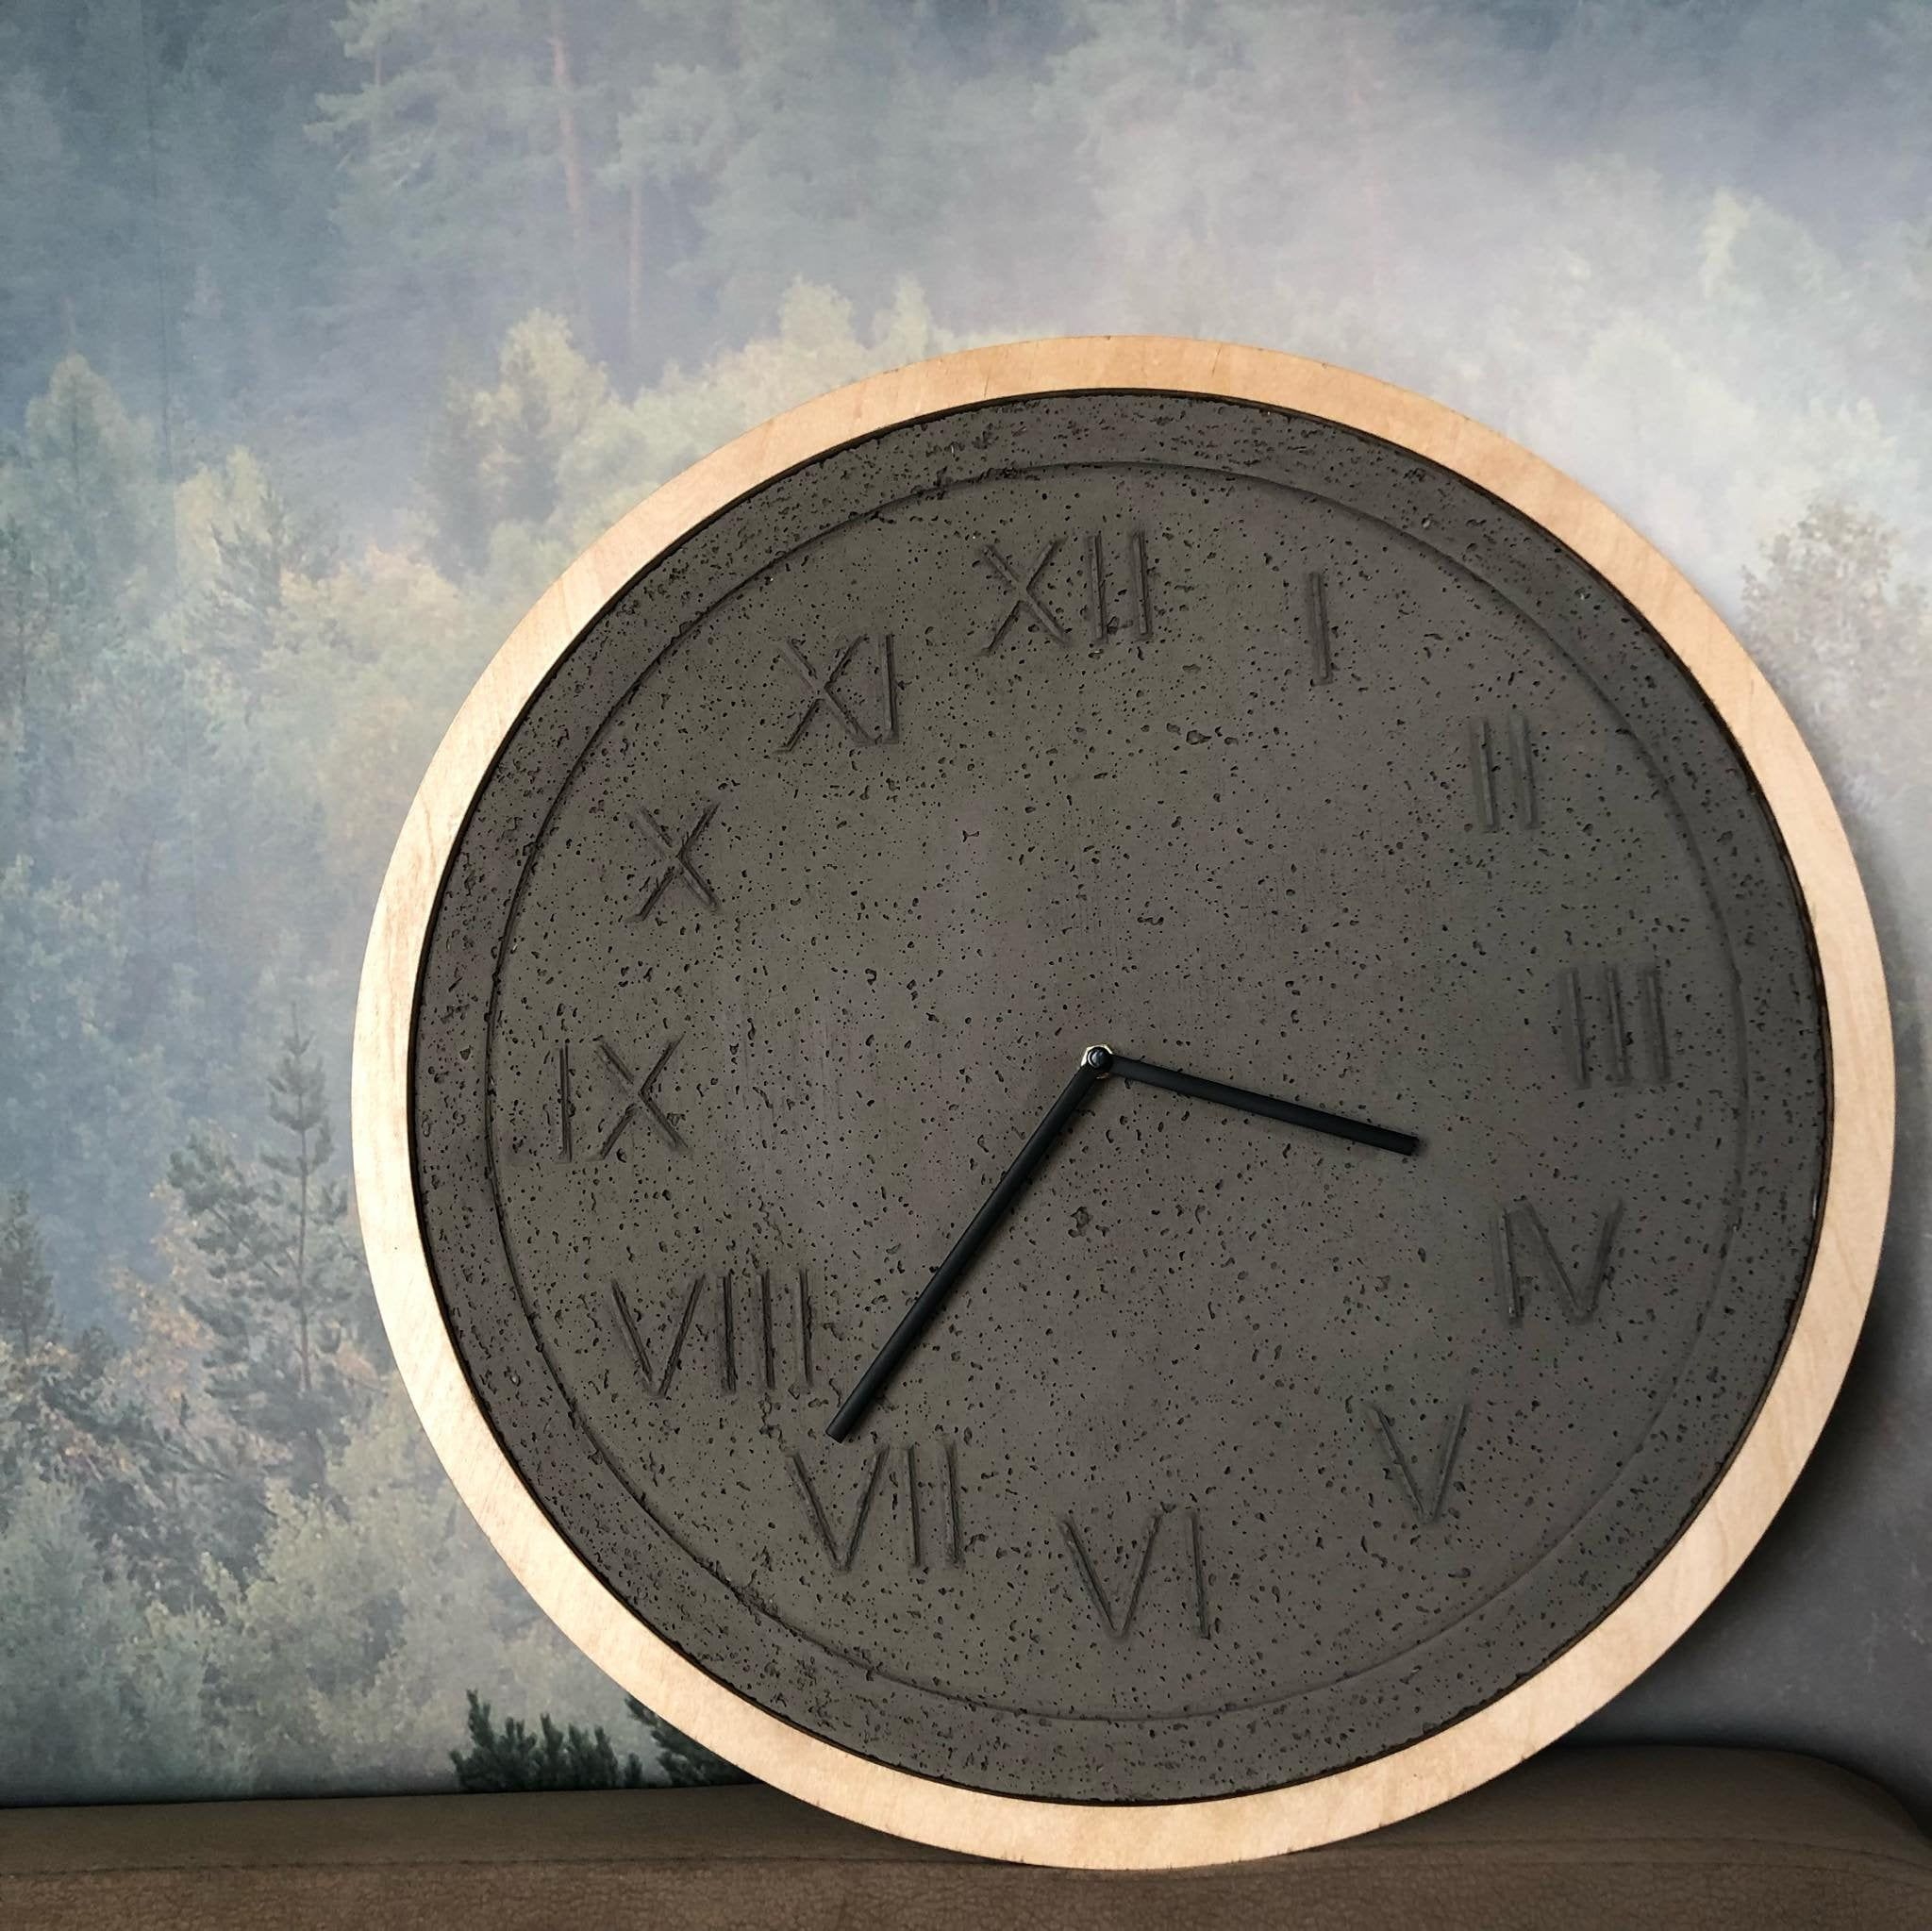 Concrete Clock Wall Clock Concrete Wooden Large Wall Clock Wood Concrete Clock Unique Wall Clock Modern Wall Clock Handmade Clock Unique Wall Clocks Wall Clock Modern Wall Clock